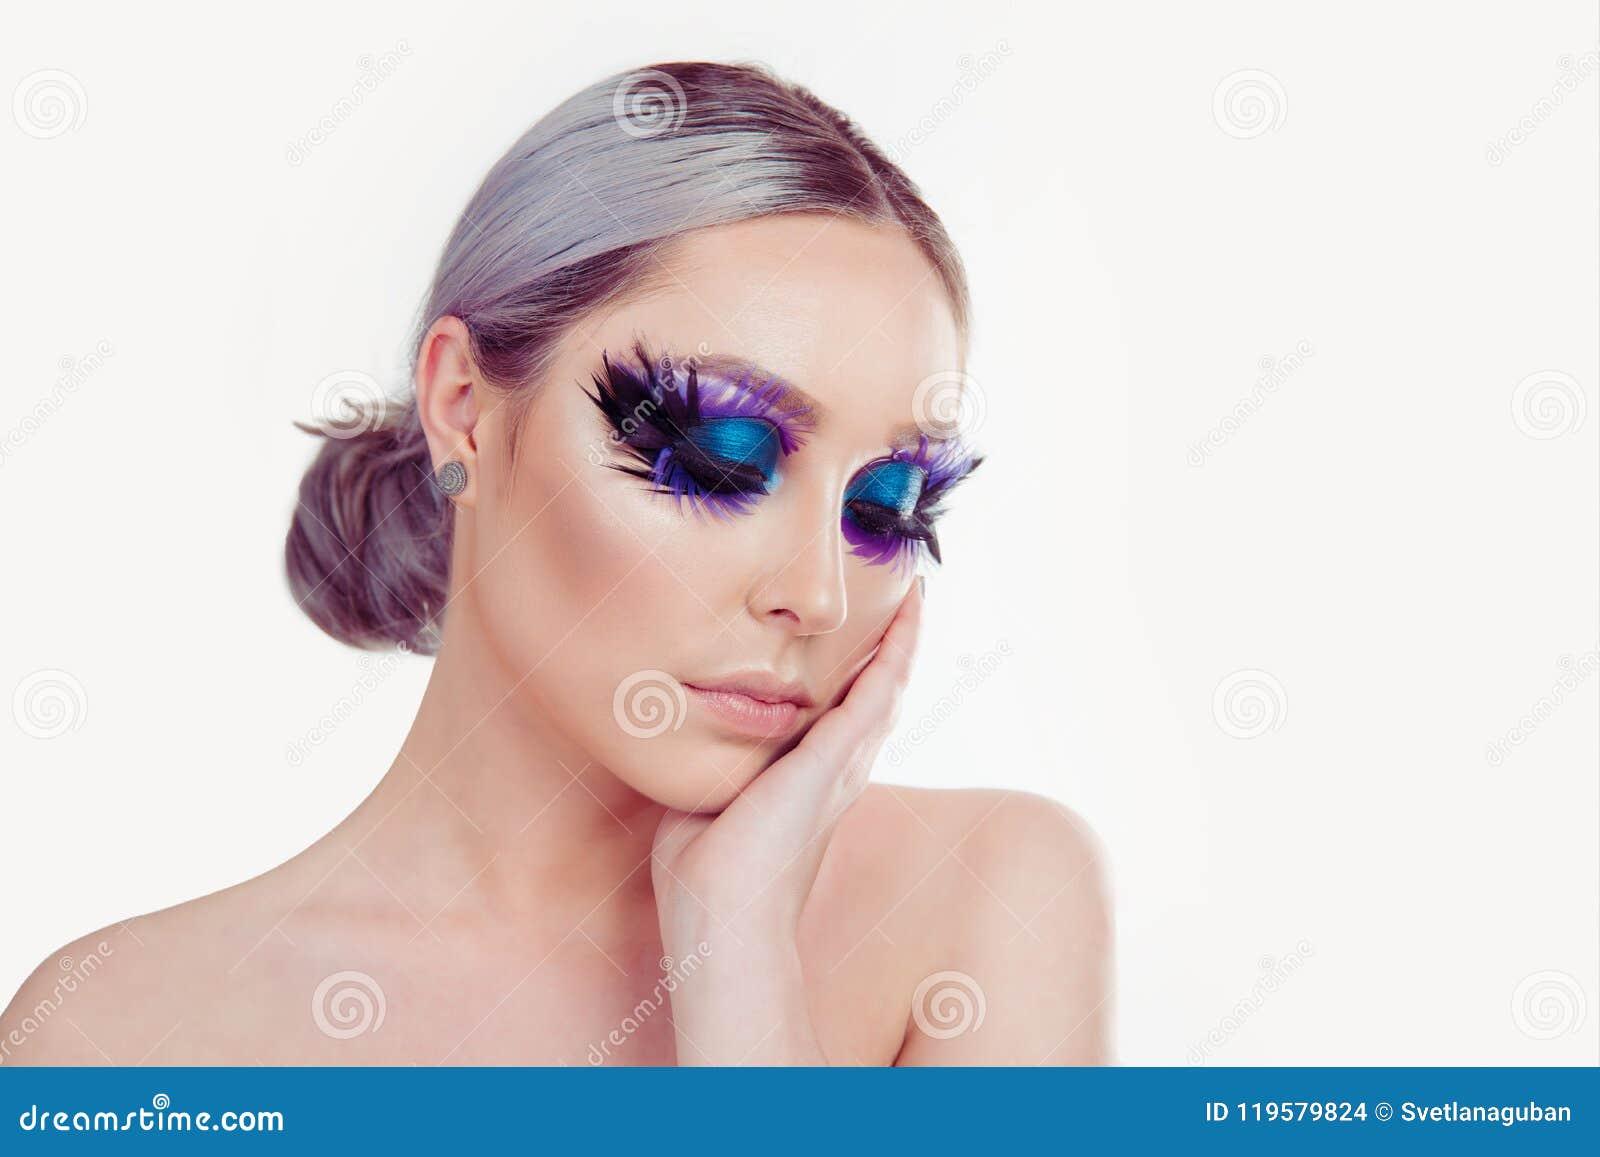 Purple Eyelashes Gallery Eye Makeup Ideas 2018